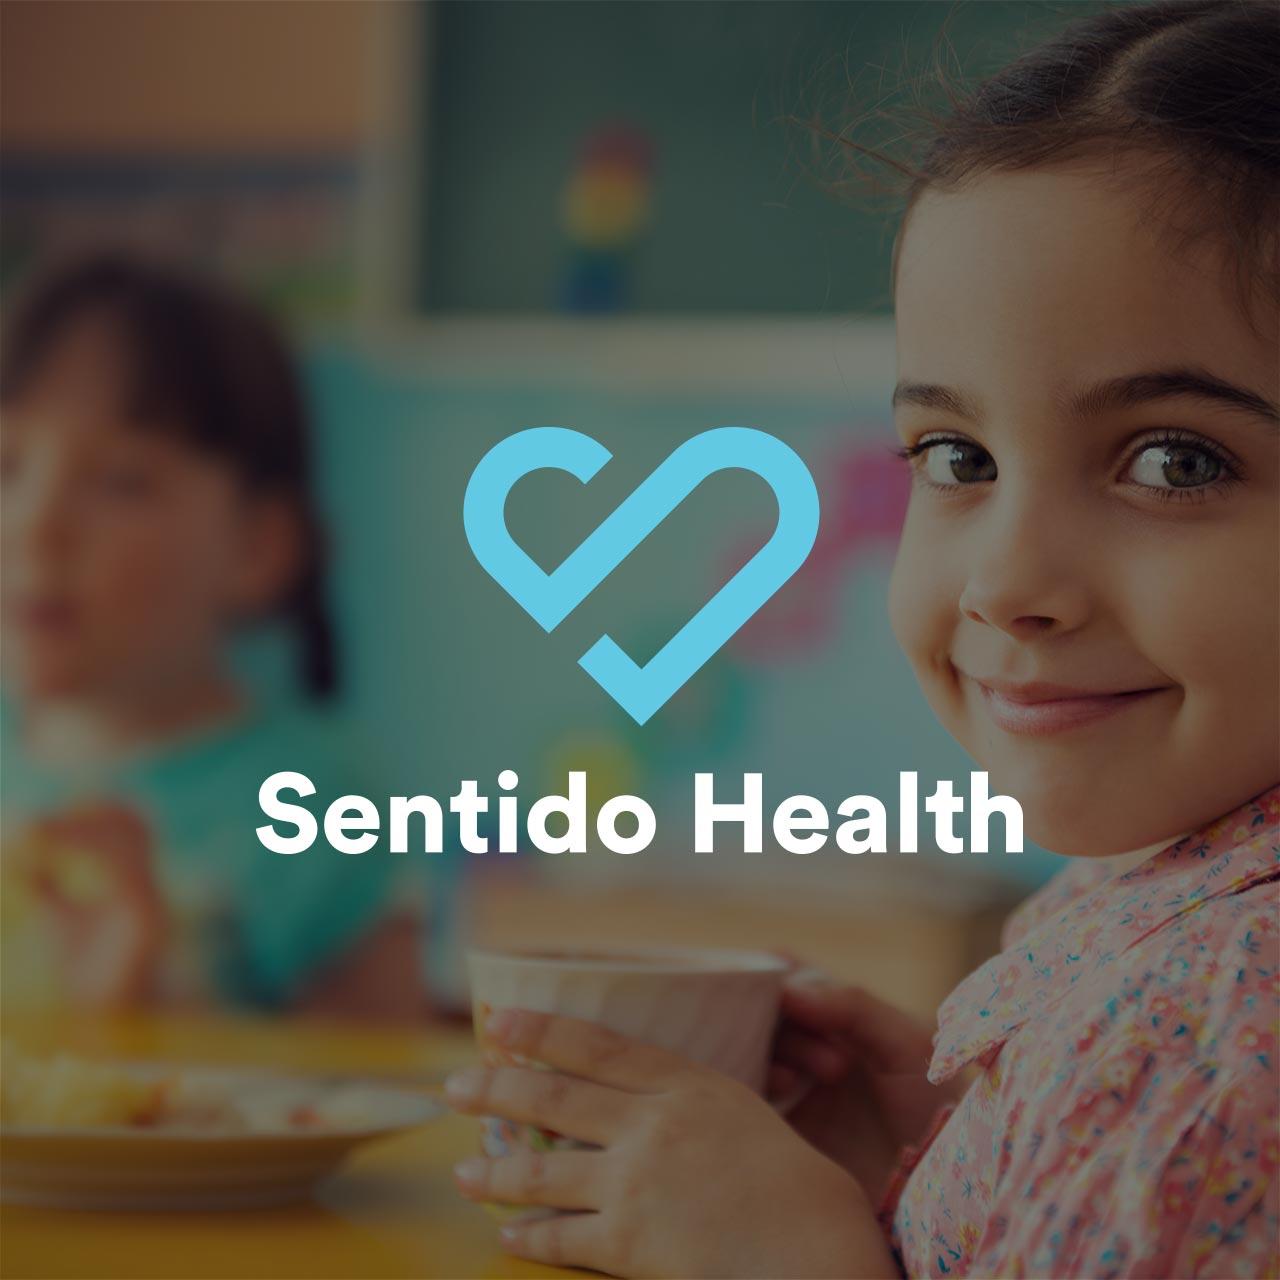 Sentido Health